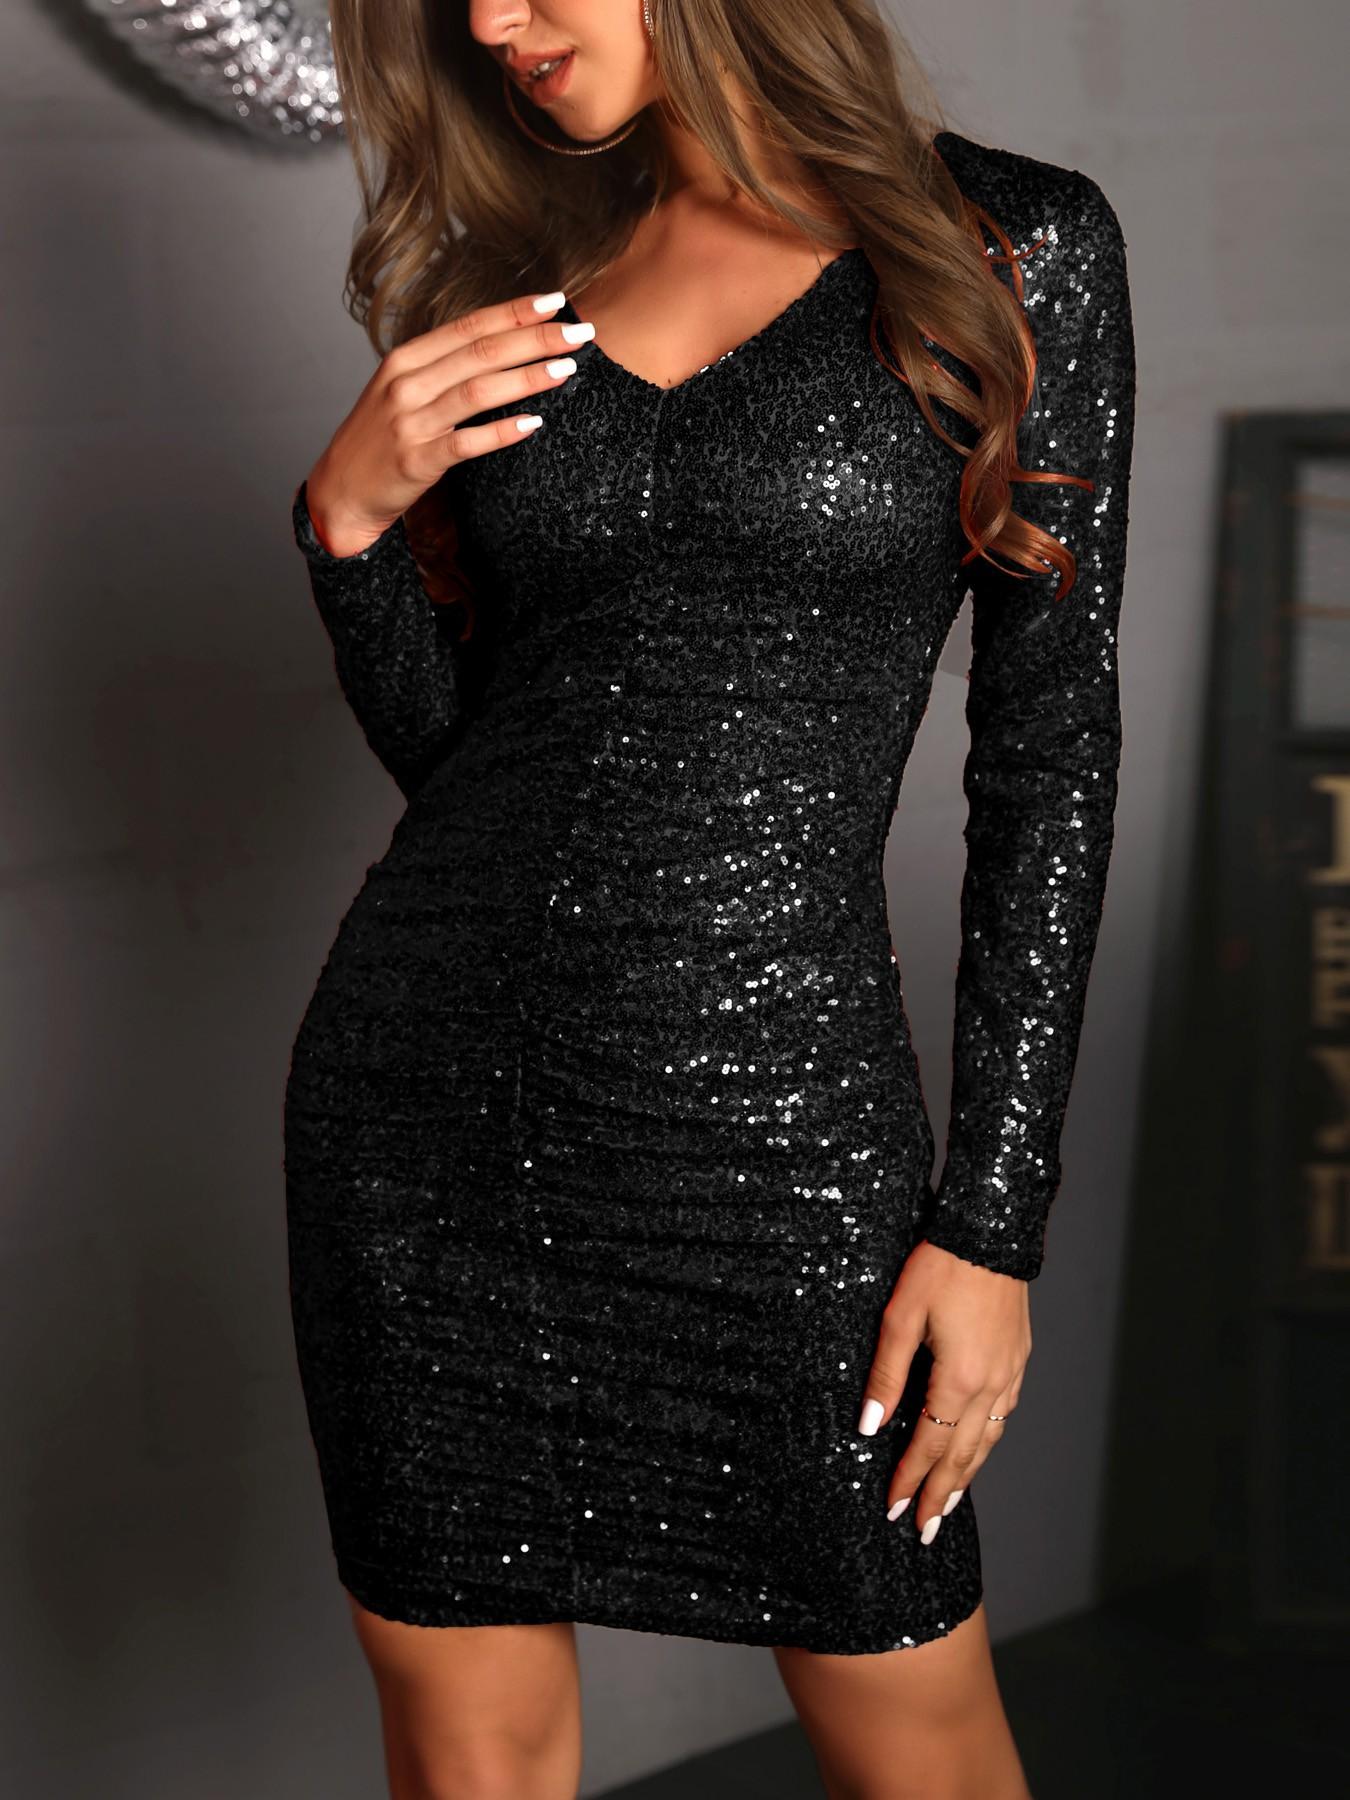 boutiquefeel / Ruched Design Sequin Dress